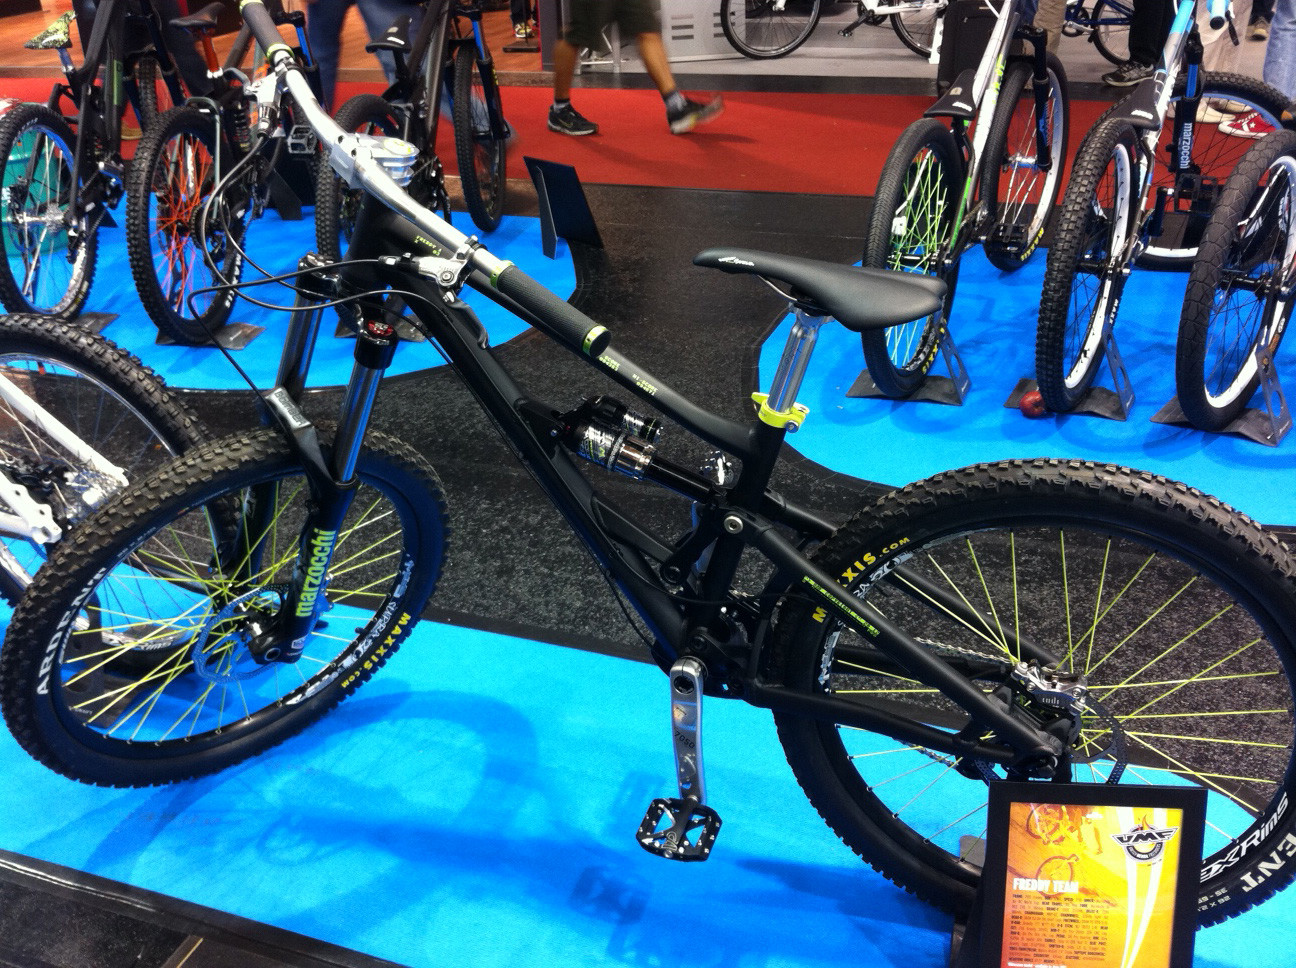 UMF Freddy - Eurobike 2011 - Mountain Biking Pictures - Vital MTB